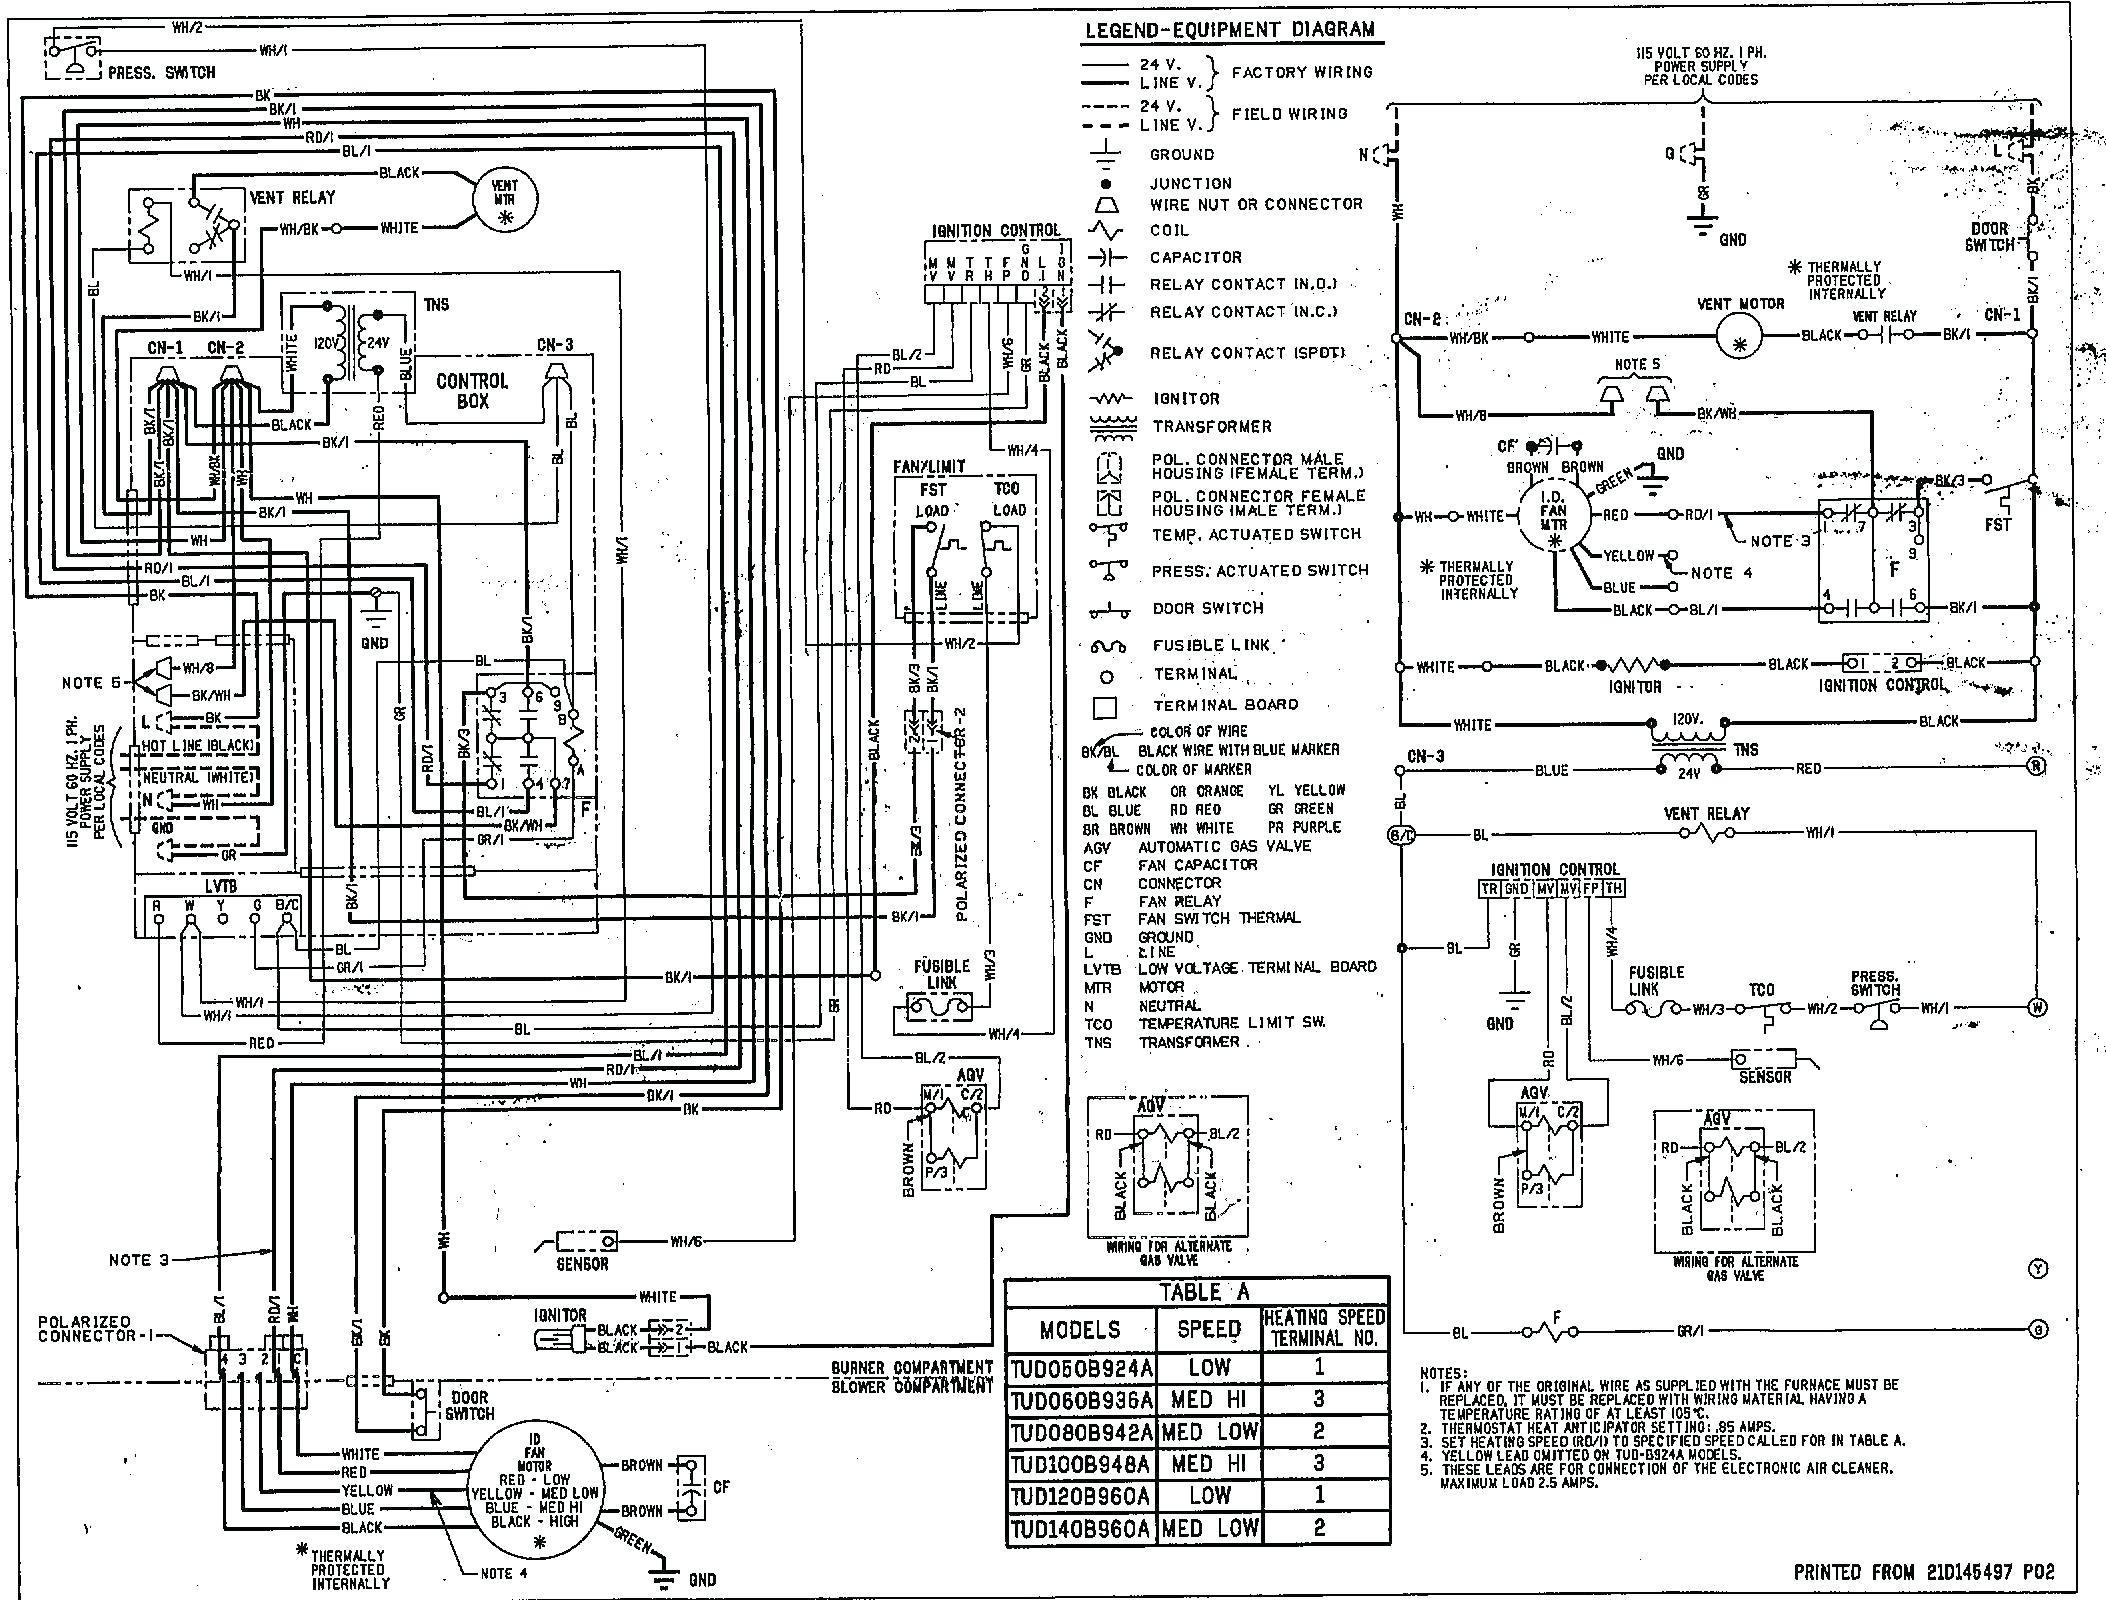 goodman heat pump goodman heat pump wiring diagram